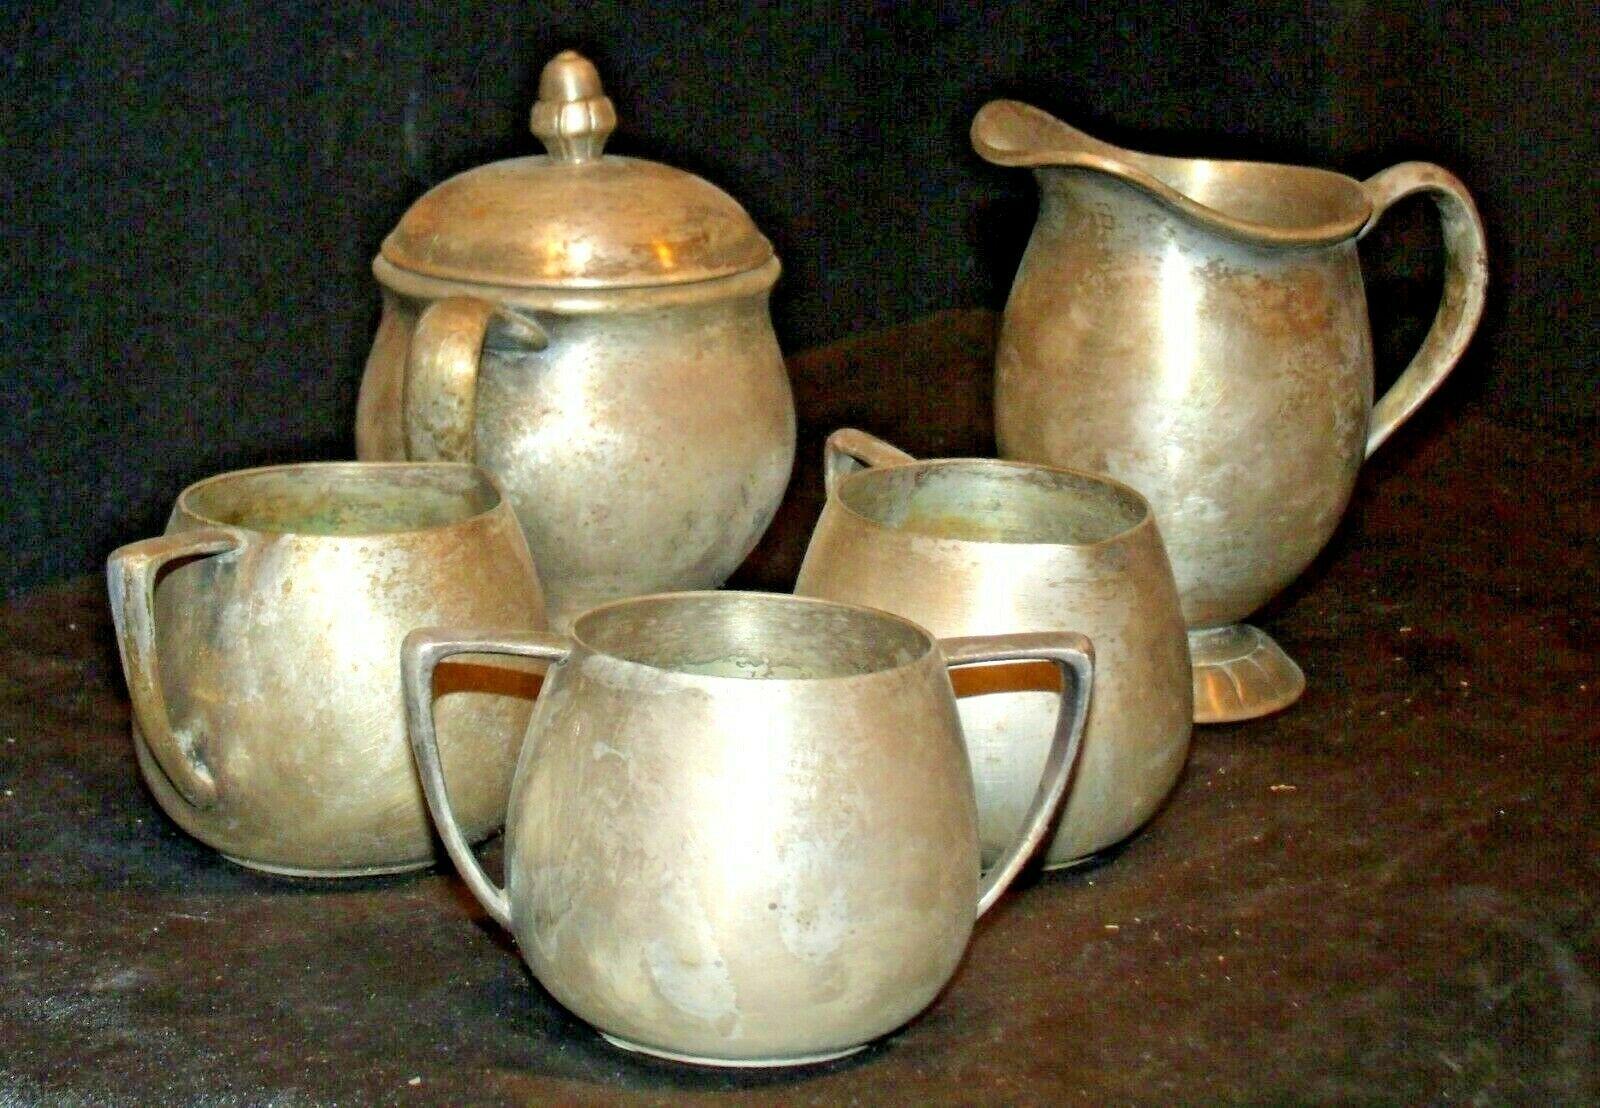 Quadruple Plated Silver Creamers & Sugar Bowls Vintage Empire Crafts AB 341